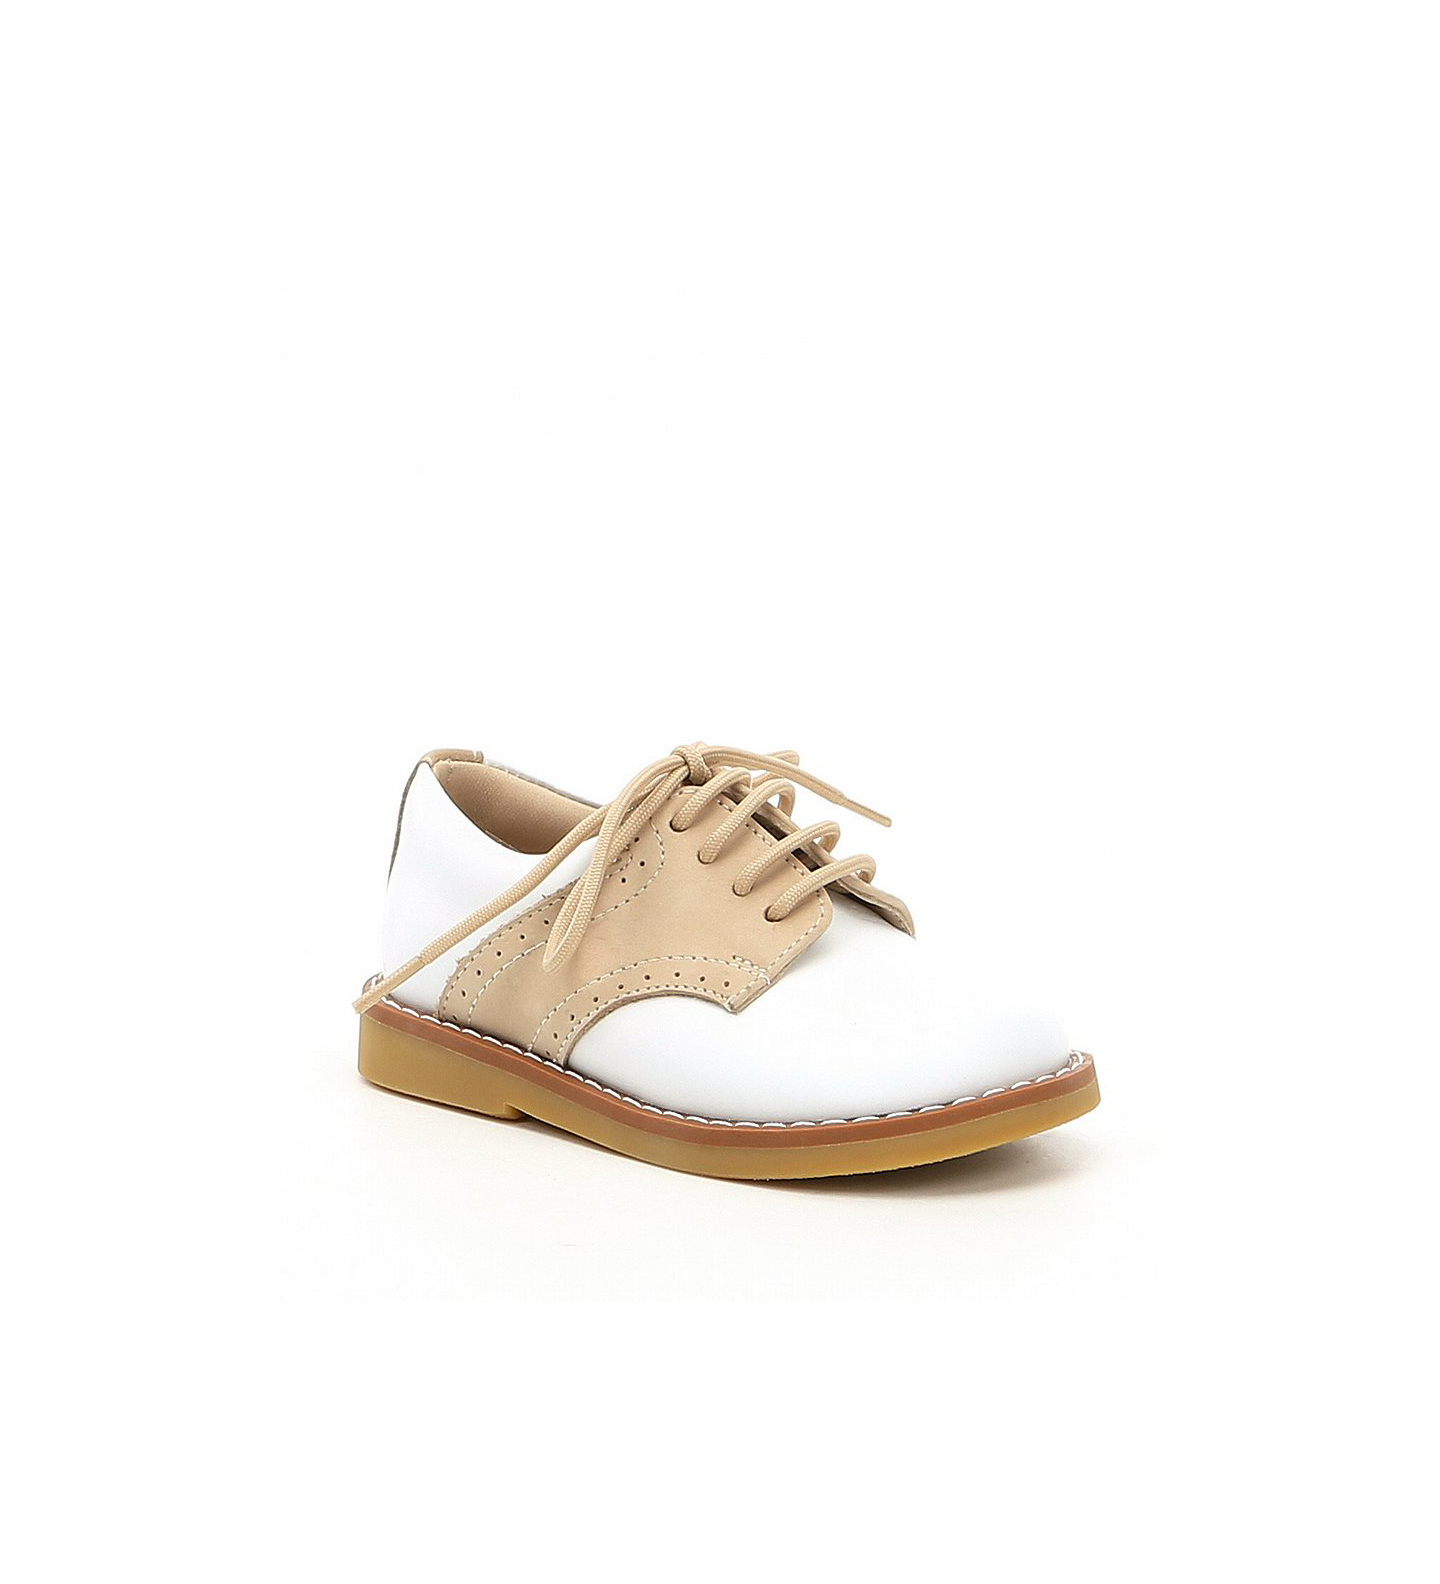 ring bearer shoes tan saddle oxfords